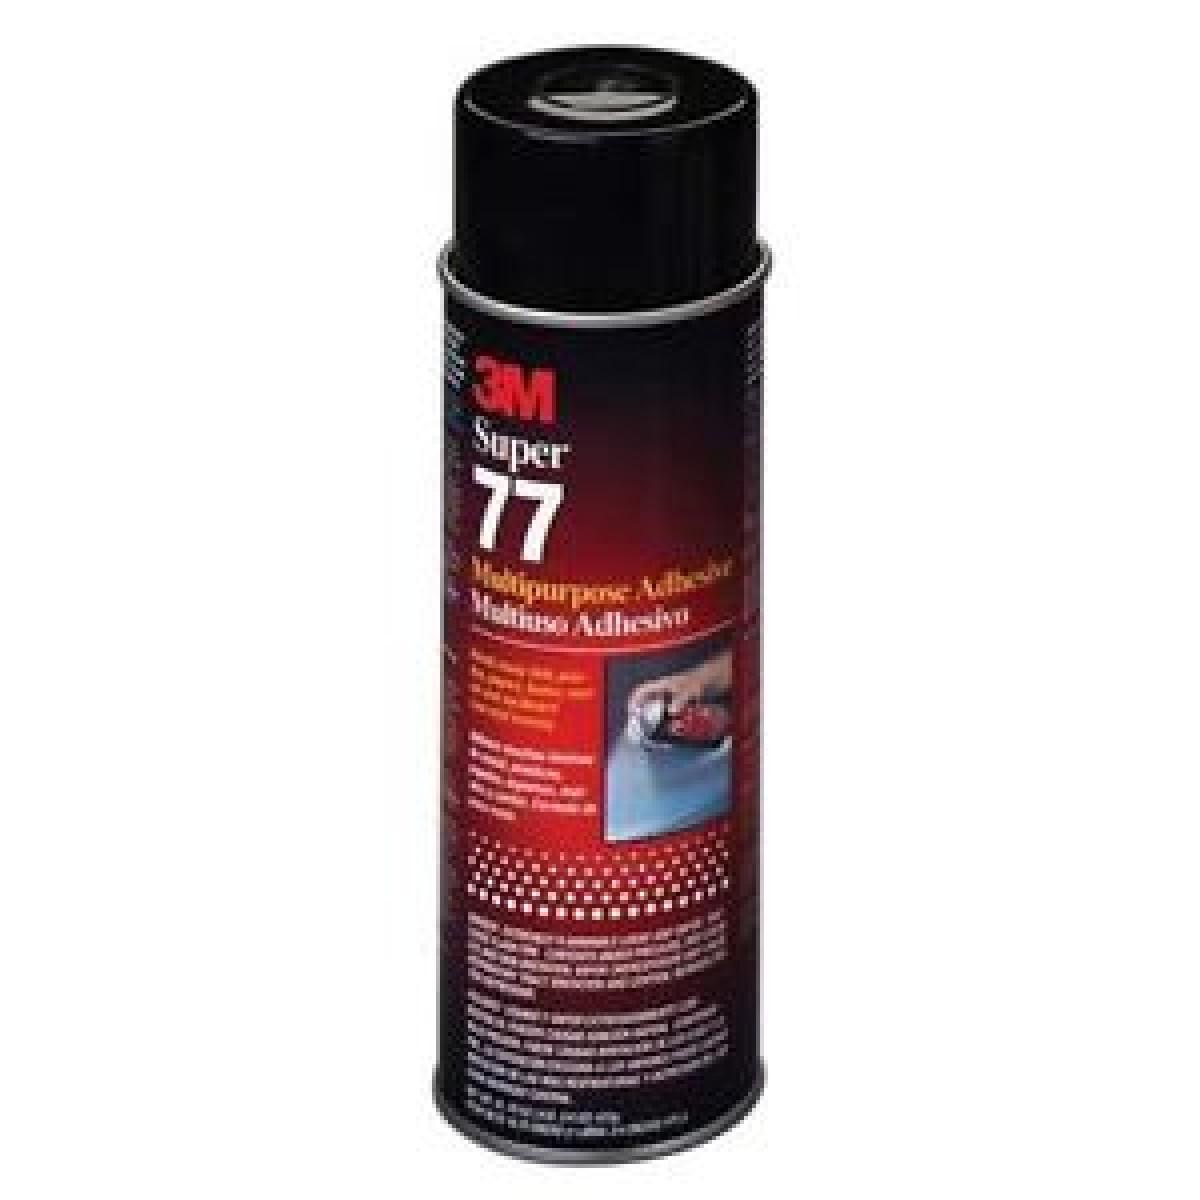 3m77 3m Super 77 Spray Adhesive Amarillo Bolt